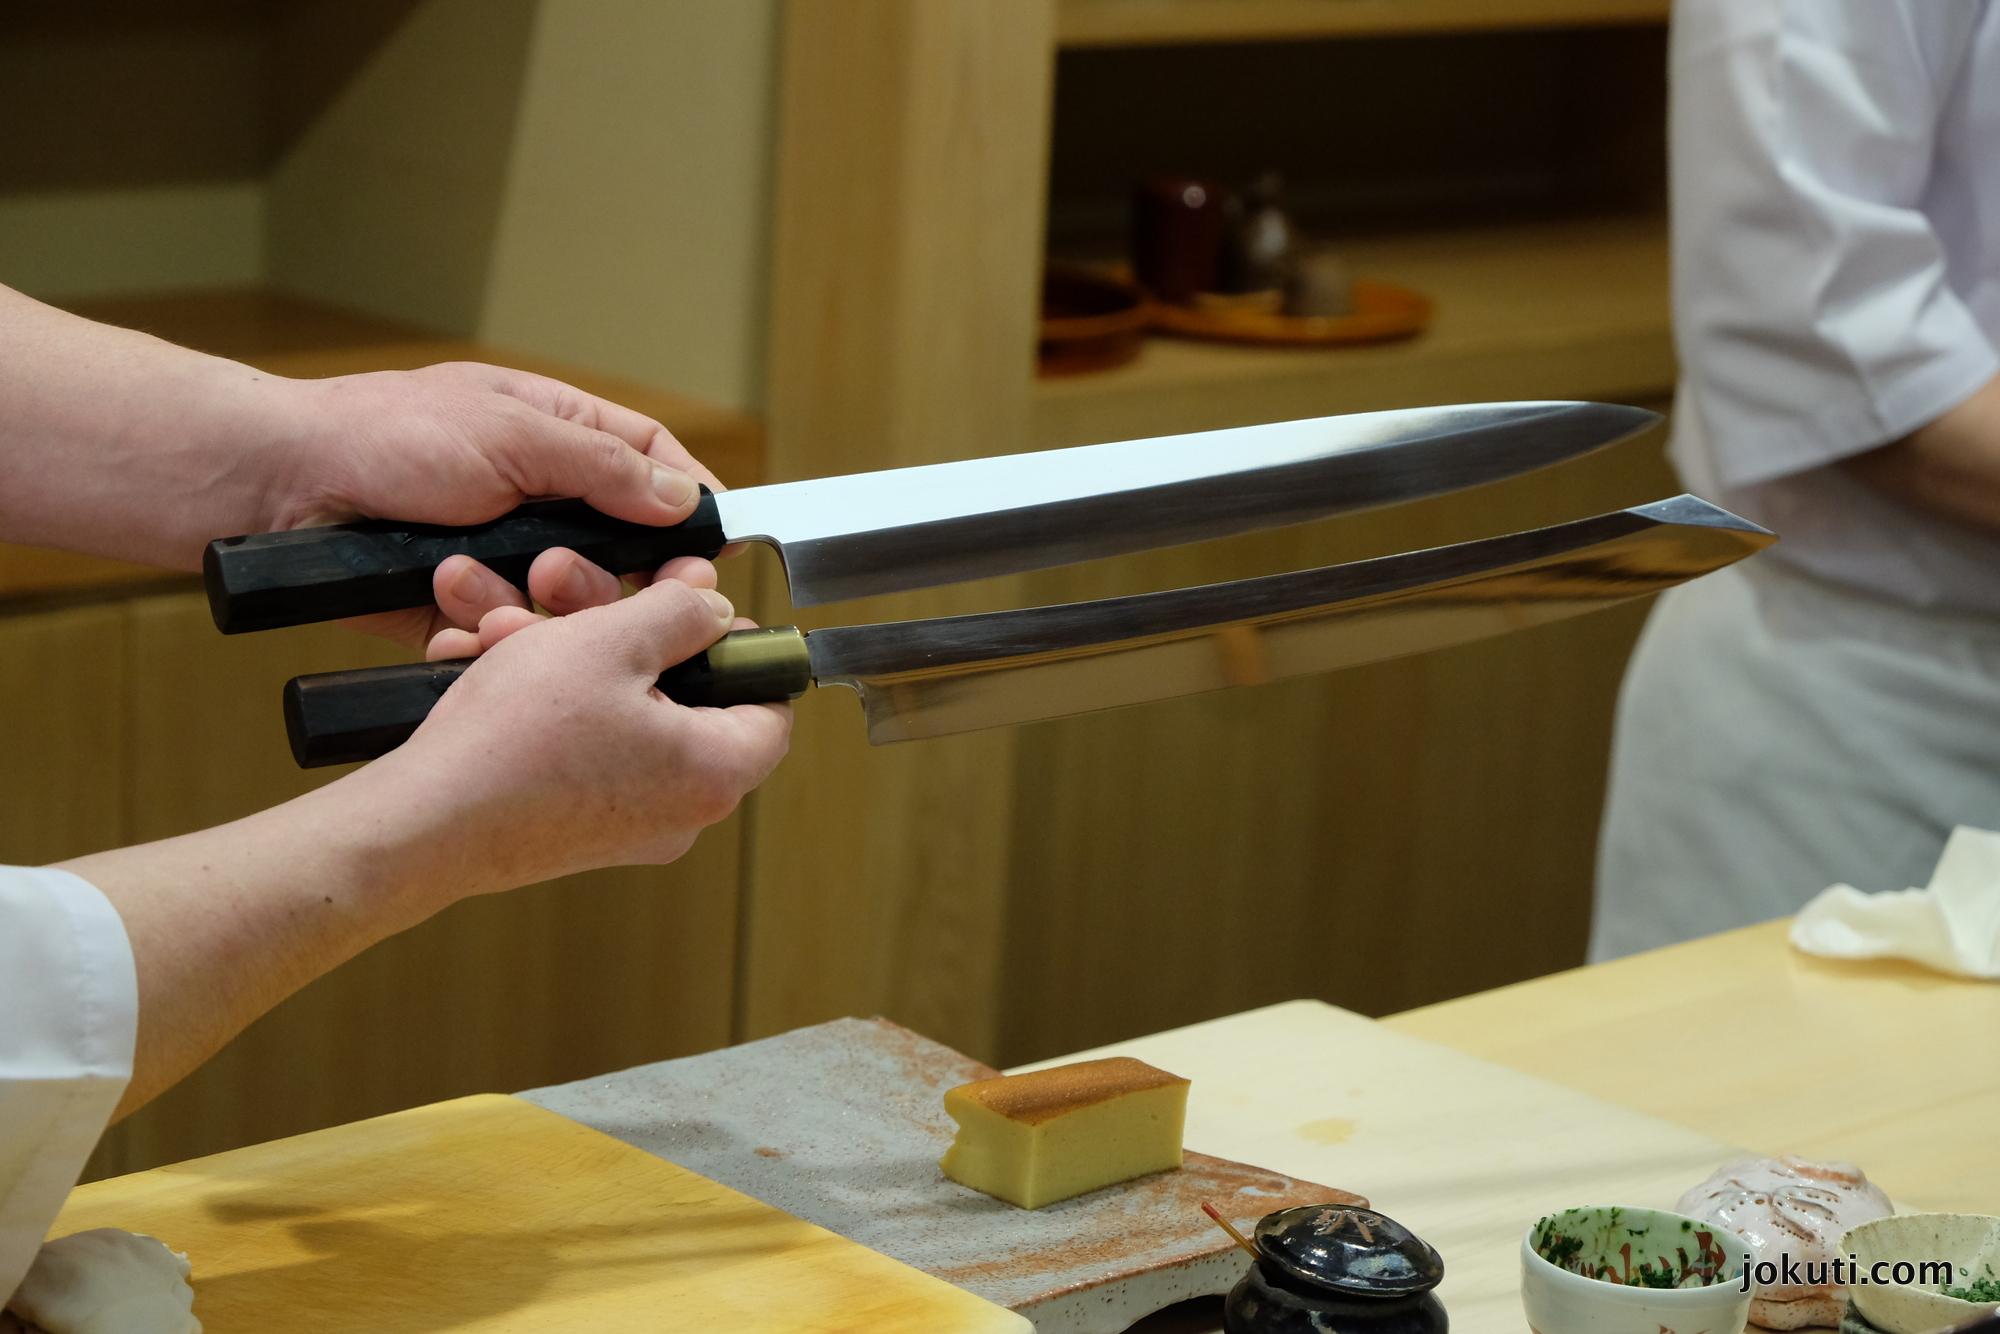 dscf5661_sugita_sushi_michelin_tokyo_japan_vilagevo_jokuti.jpg